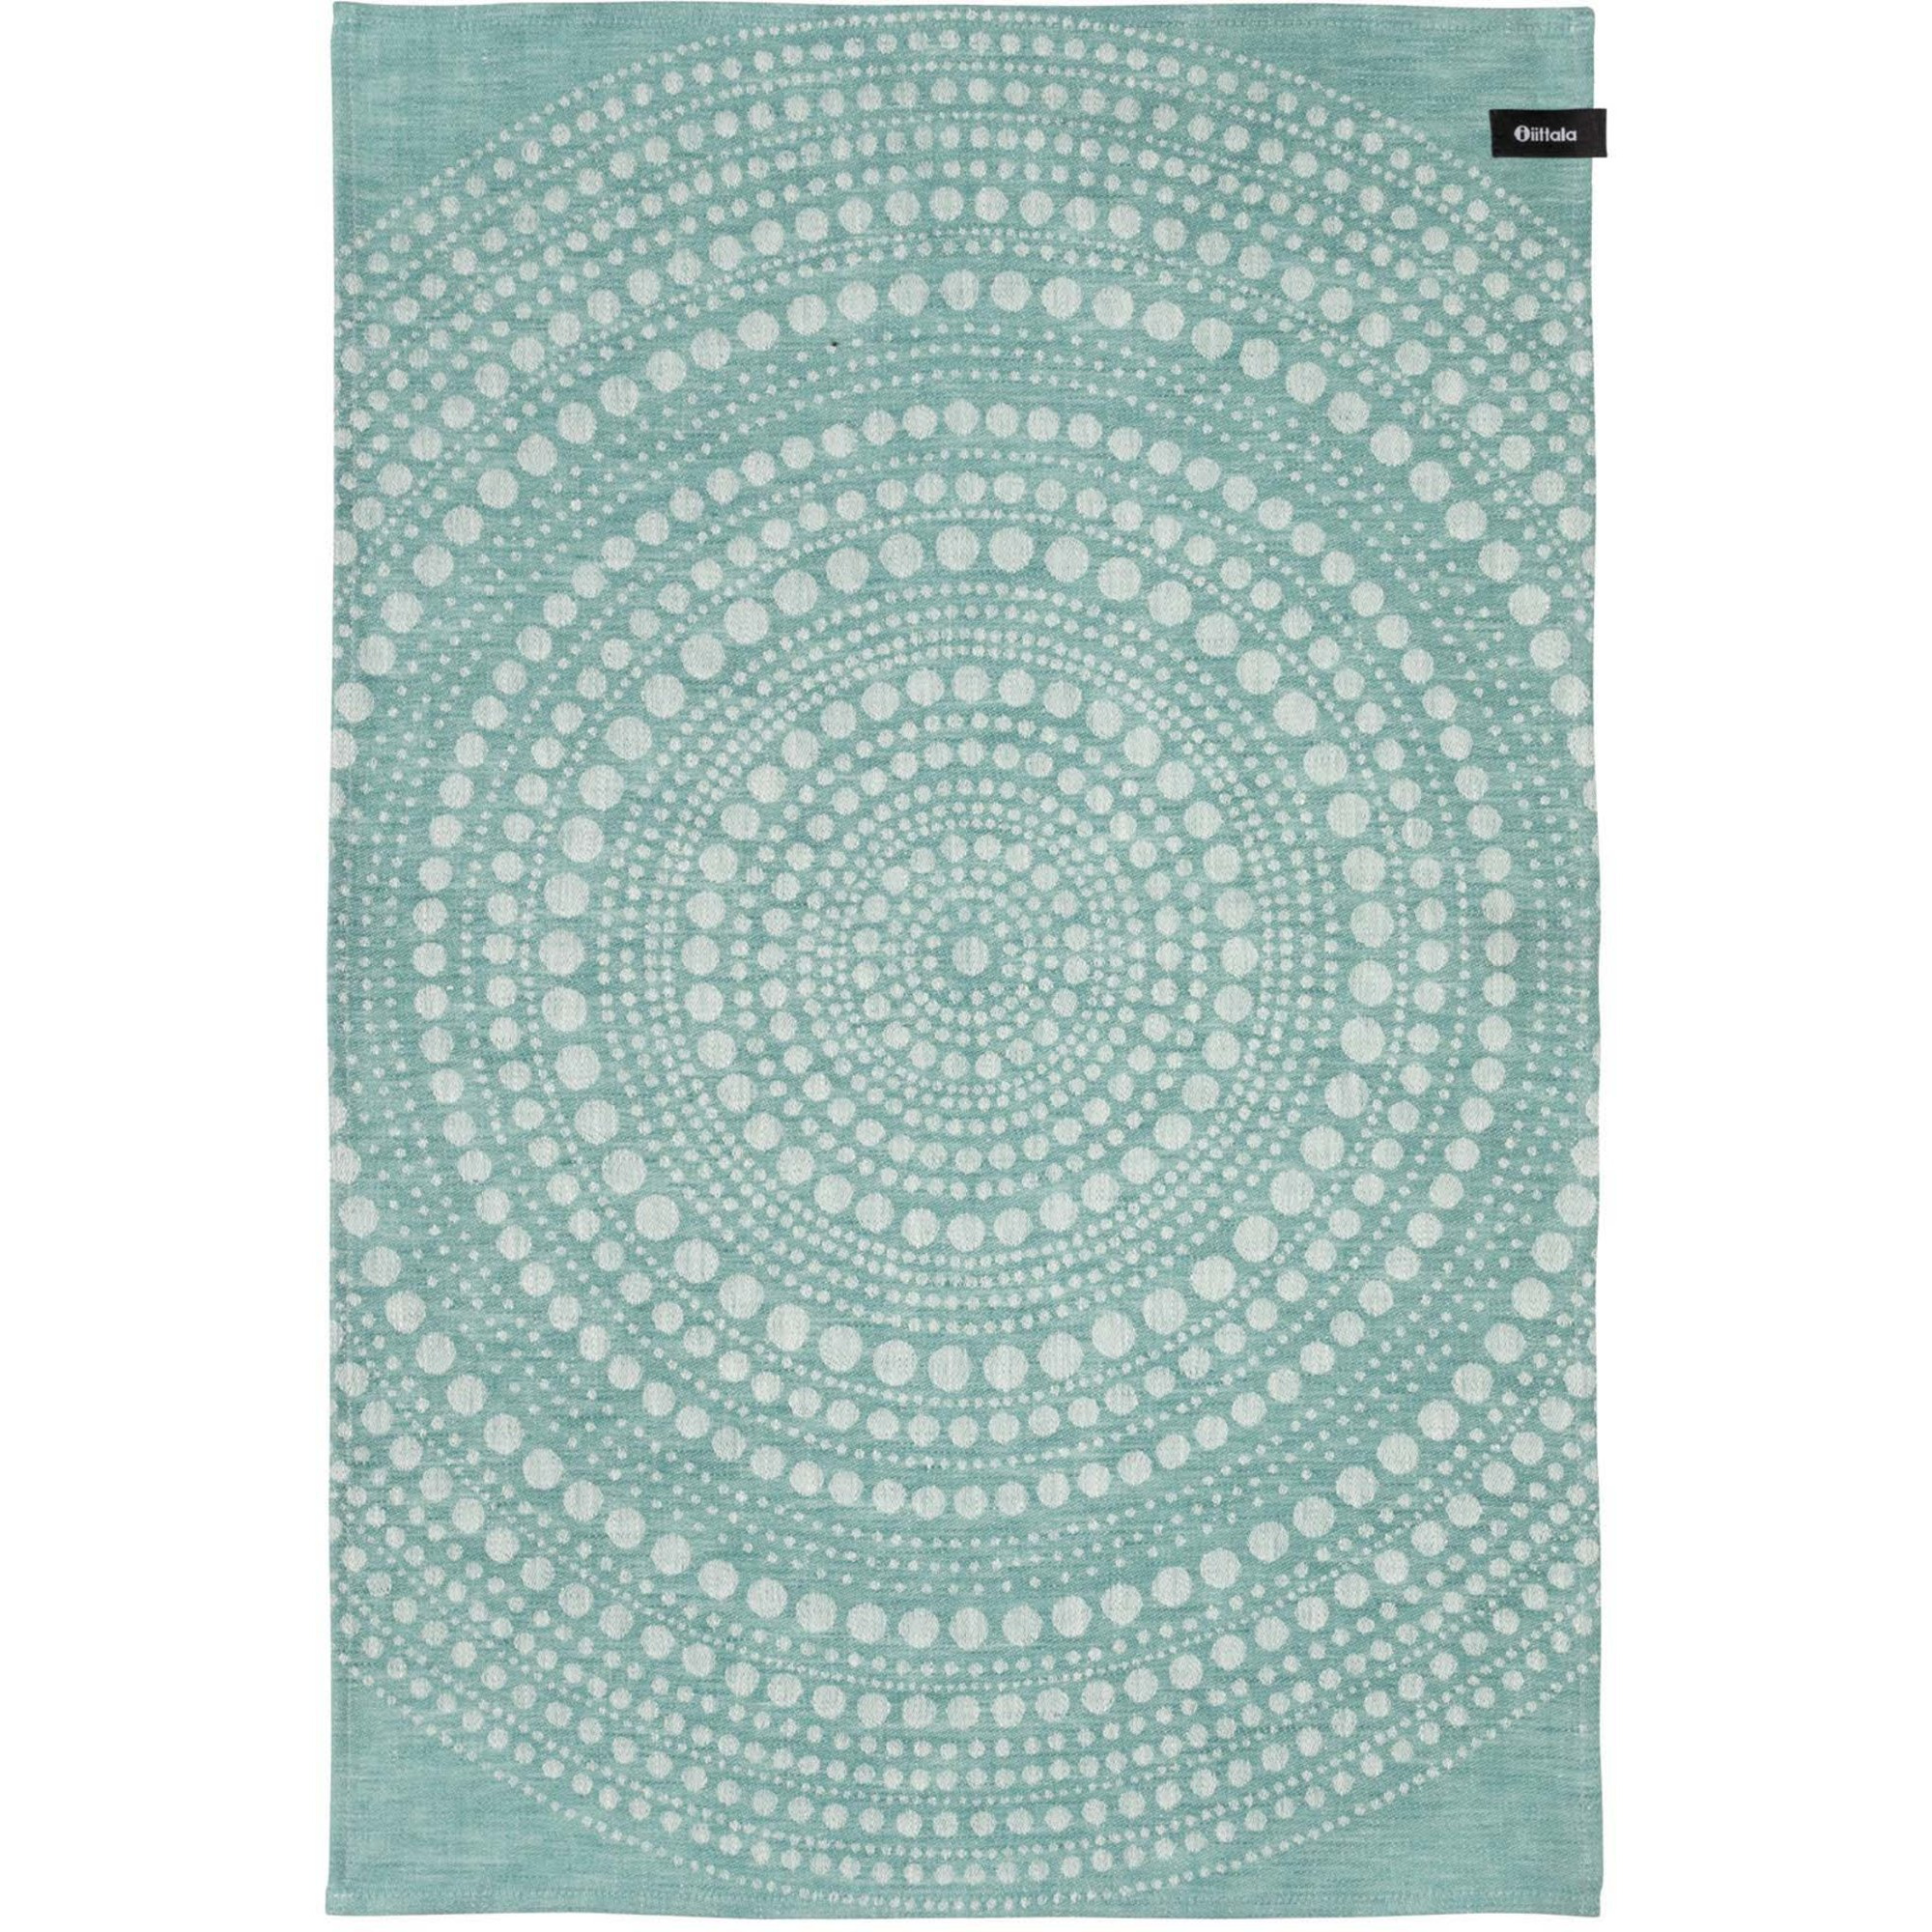 Iittala Kastehelmi kökshandduk 47×70 cm havsblå